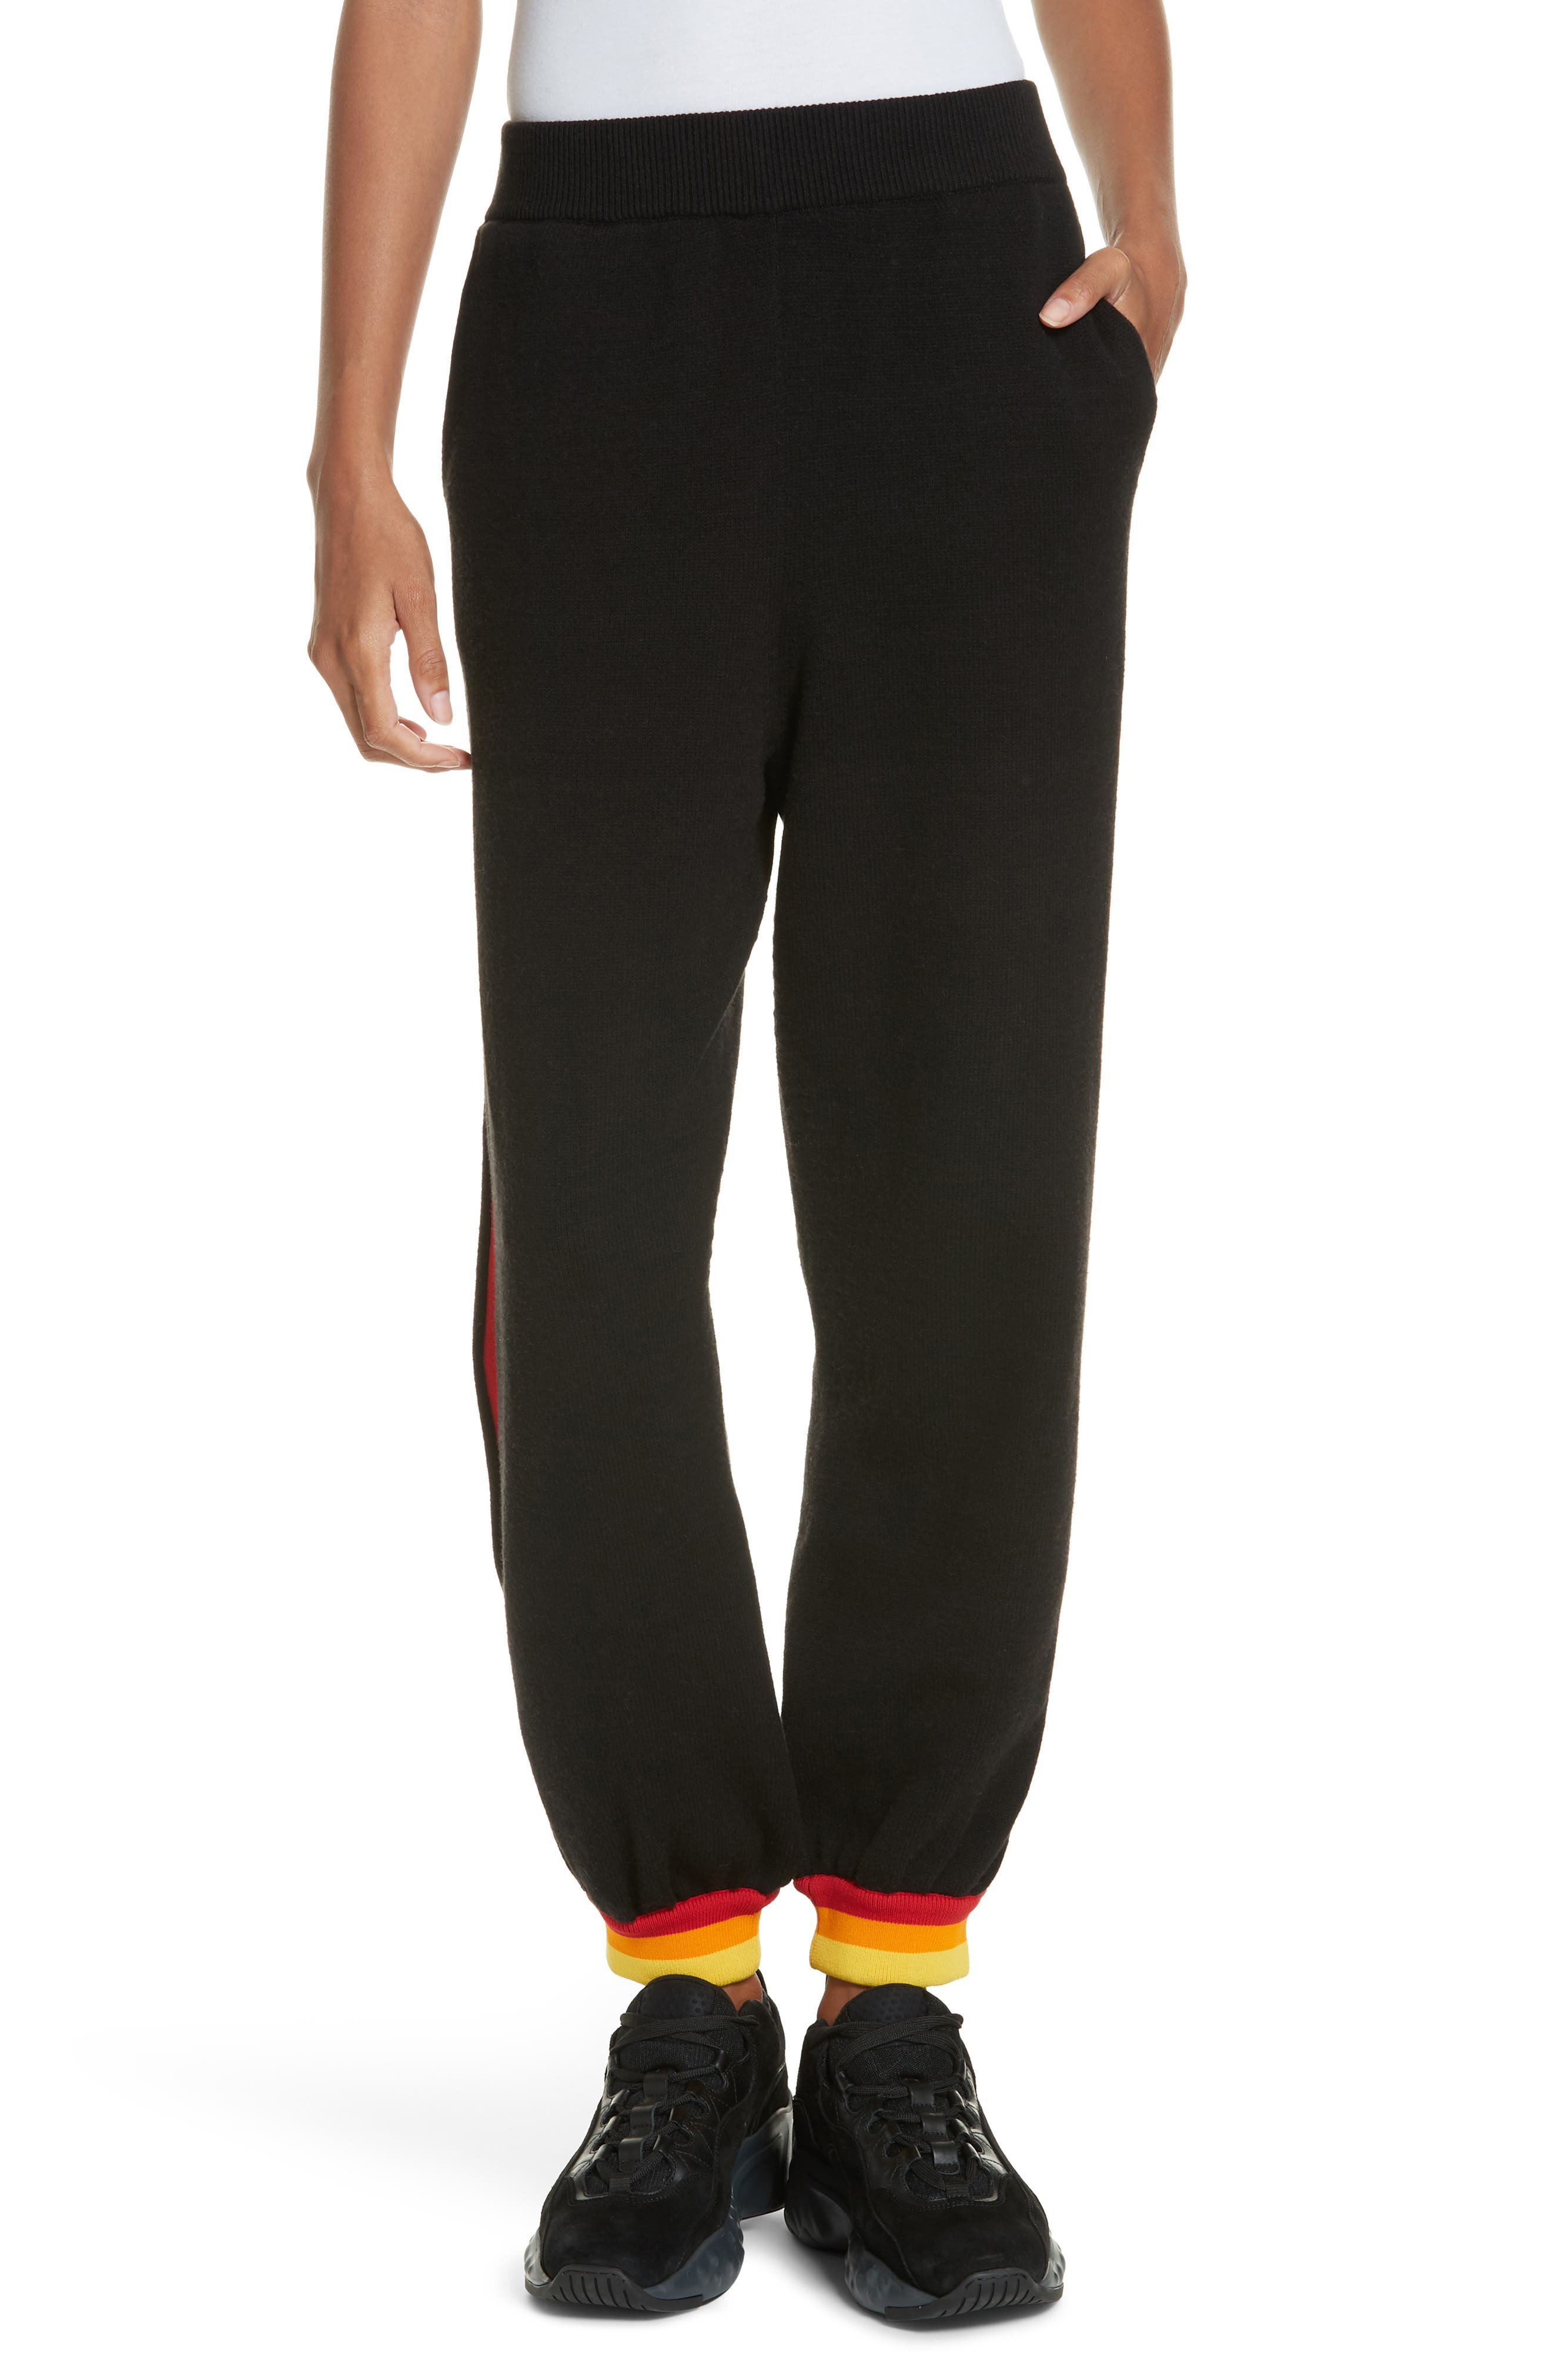 OPENING CEREMONY Unisex Jogger Pants, Main, color, BLACK MULTI